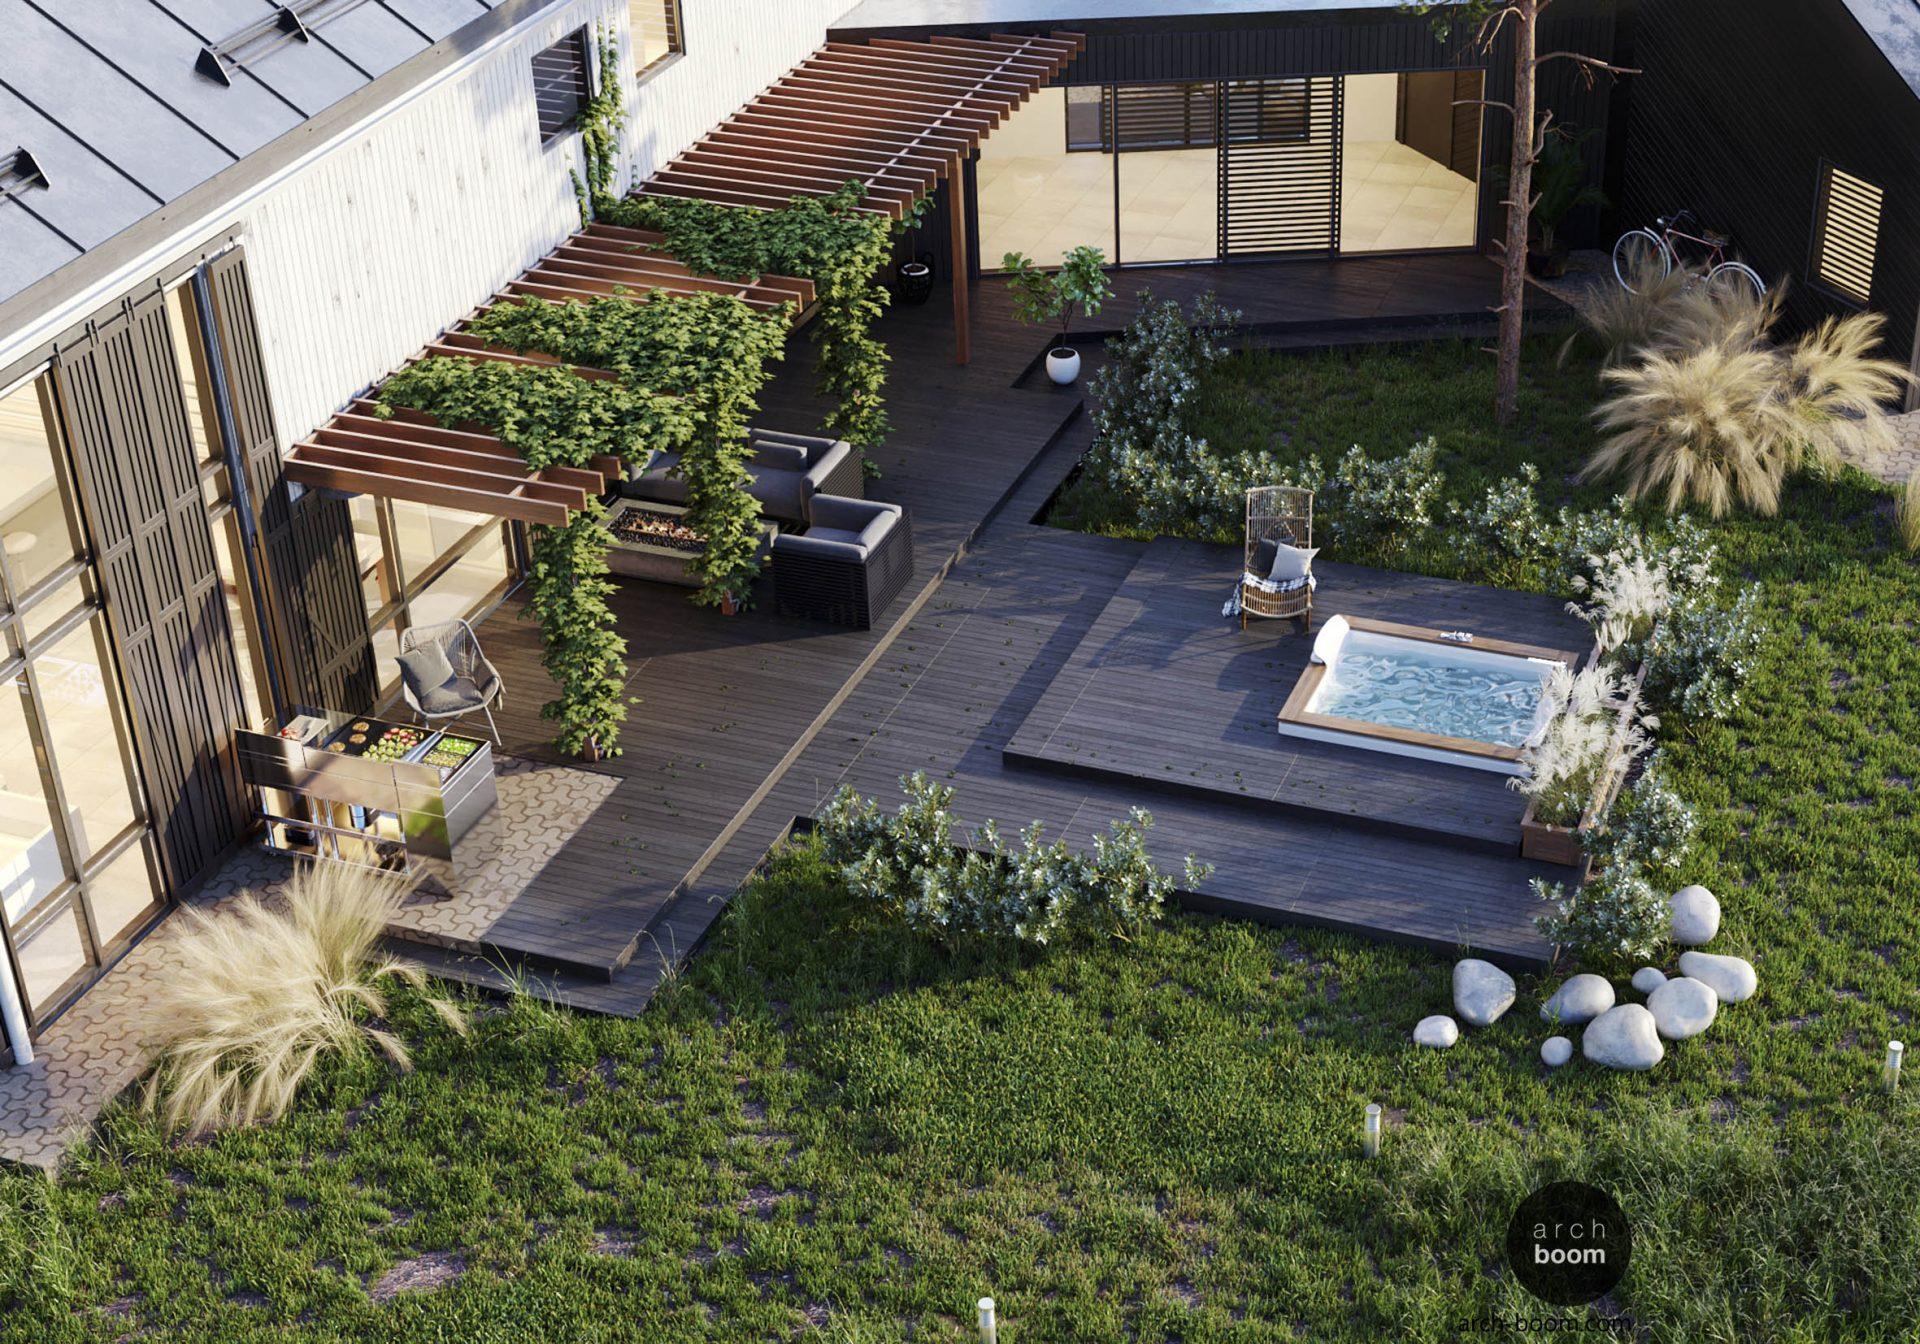 ogrodowe spa projekt ogrodu